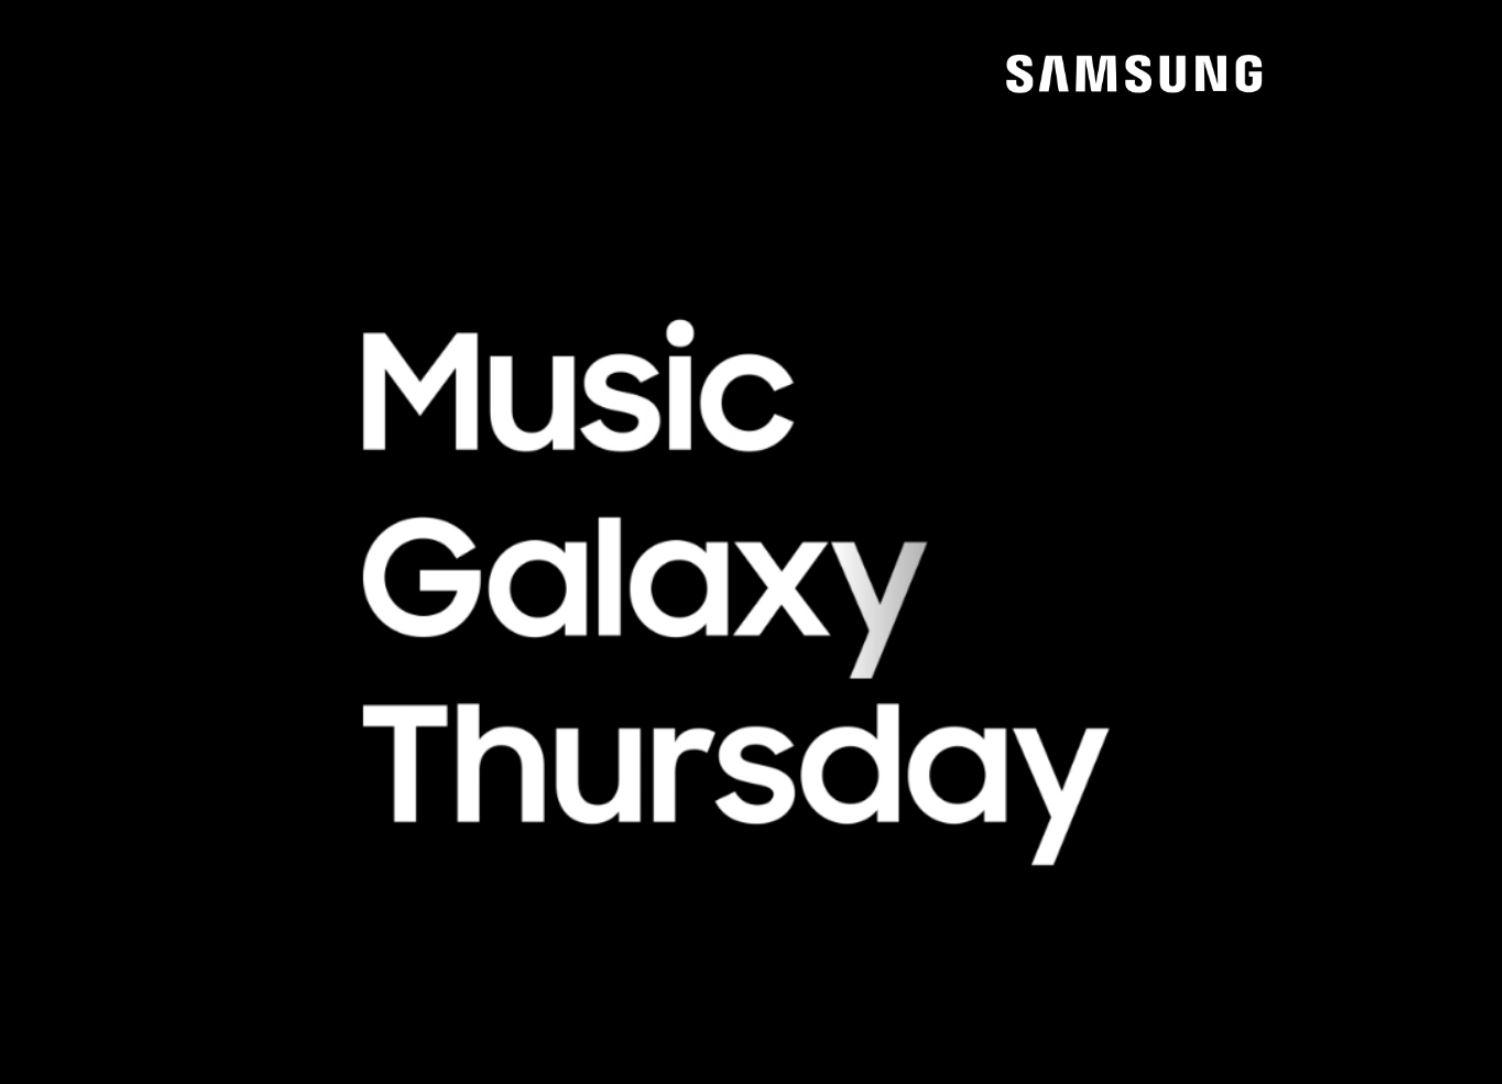 Samsung lancia i Music Galaxy Thursday con YUNGBLUD e Madame